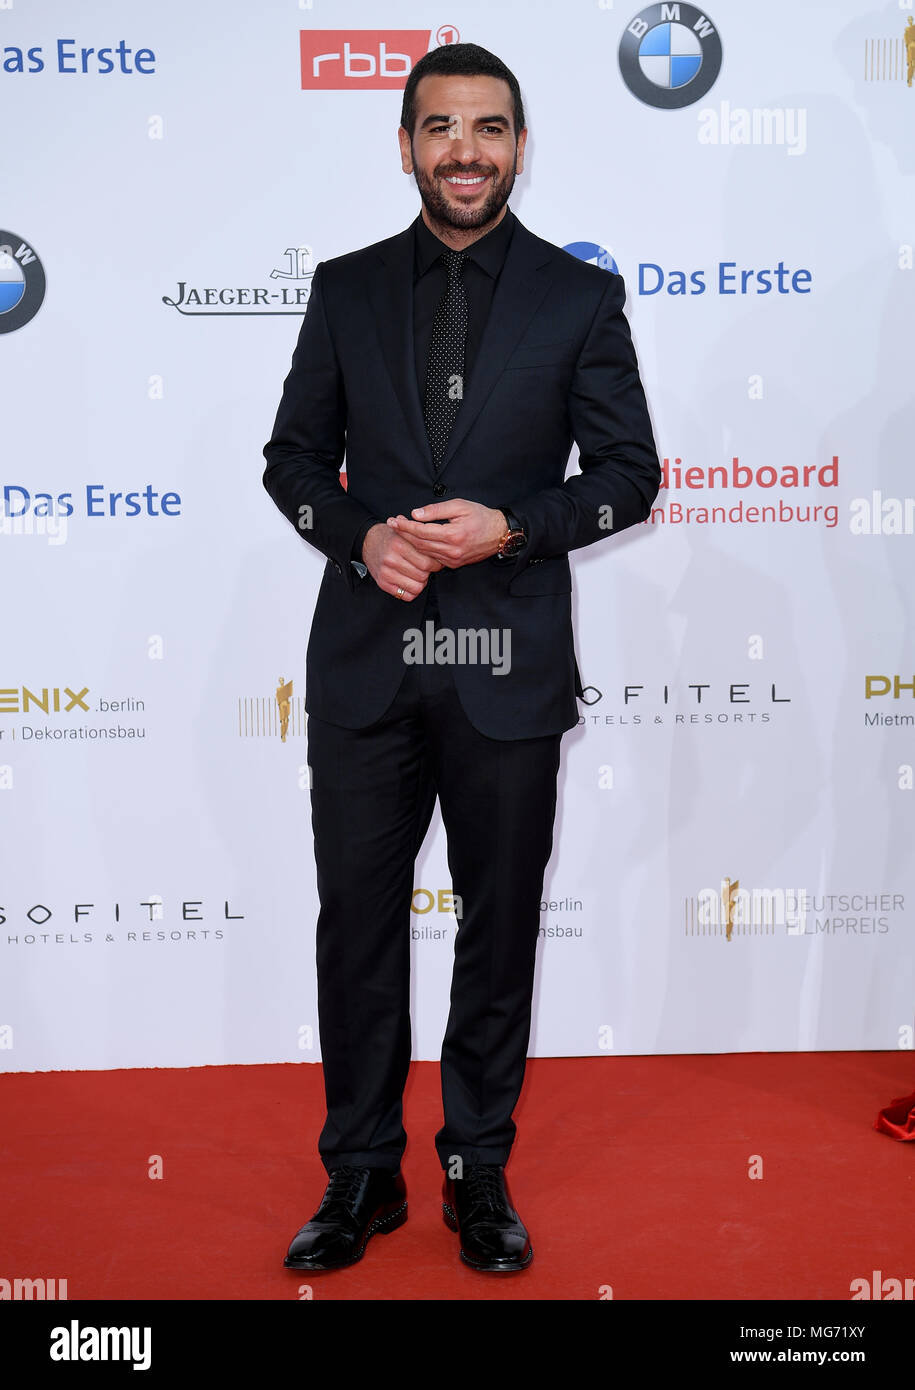 27 April 2018 Deutschland Berlin Schauspieler Elyas Mbarek Bei